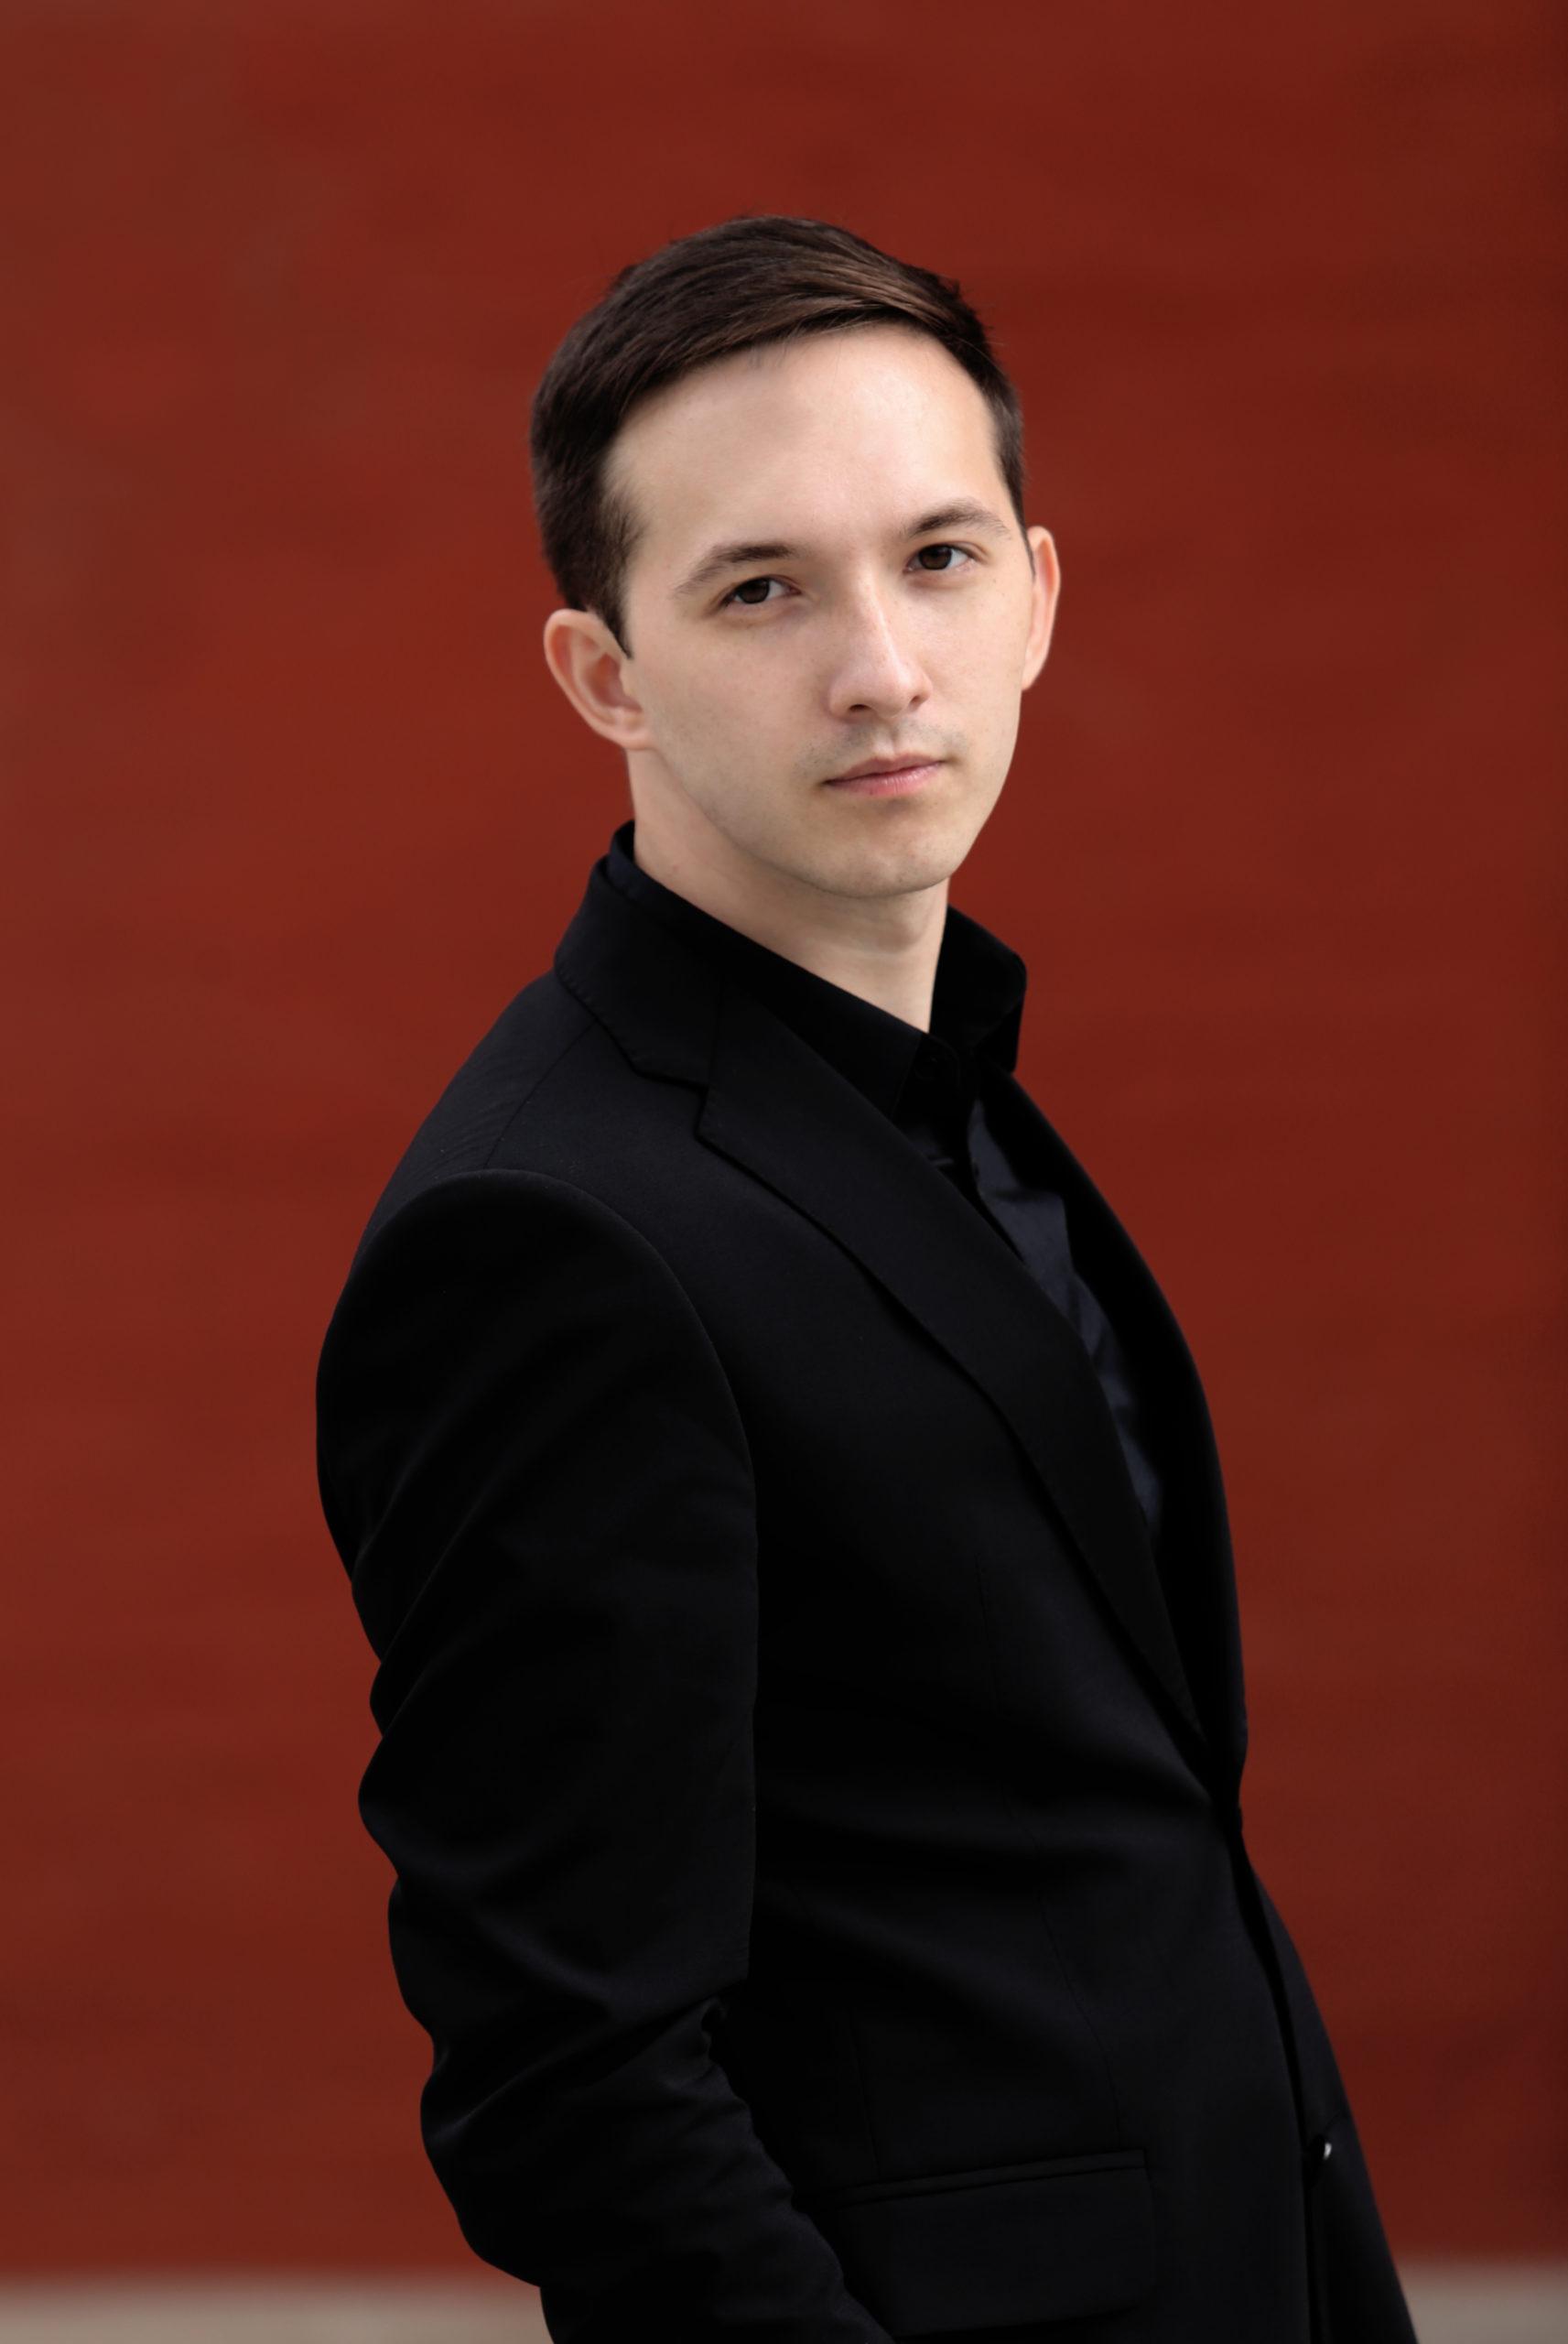 Sergey Tanin